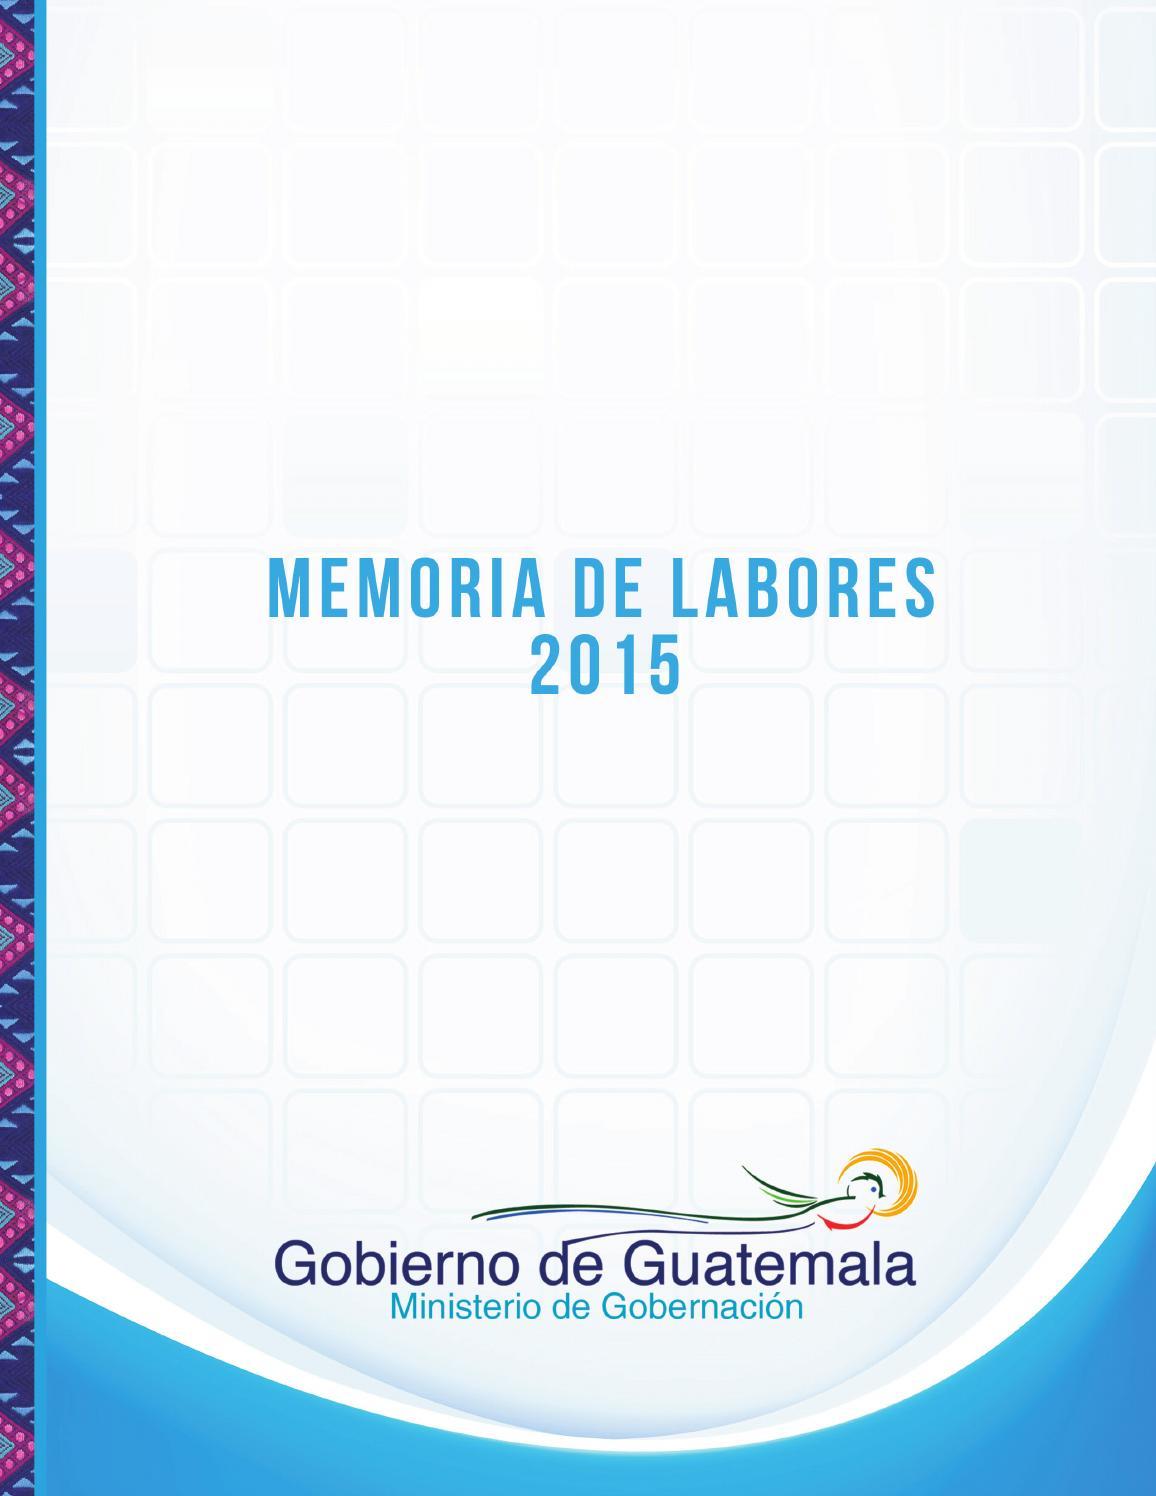 Memoria de labores mingob 2015 by ministerio de for Ministerio de gobernacion